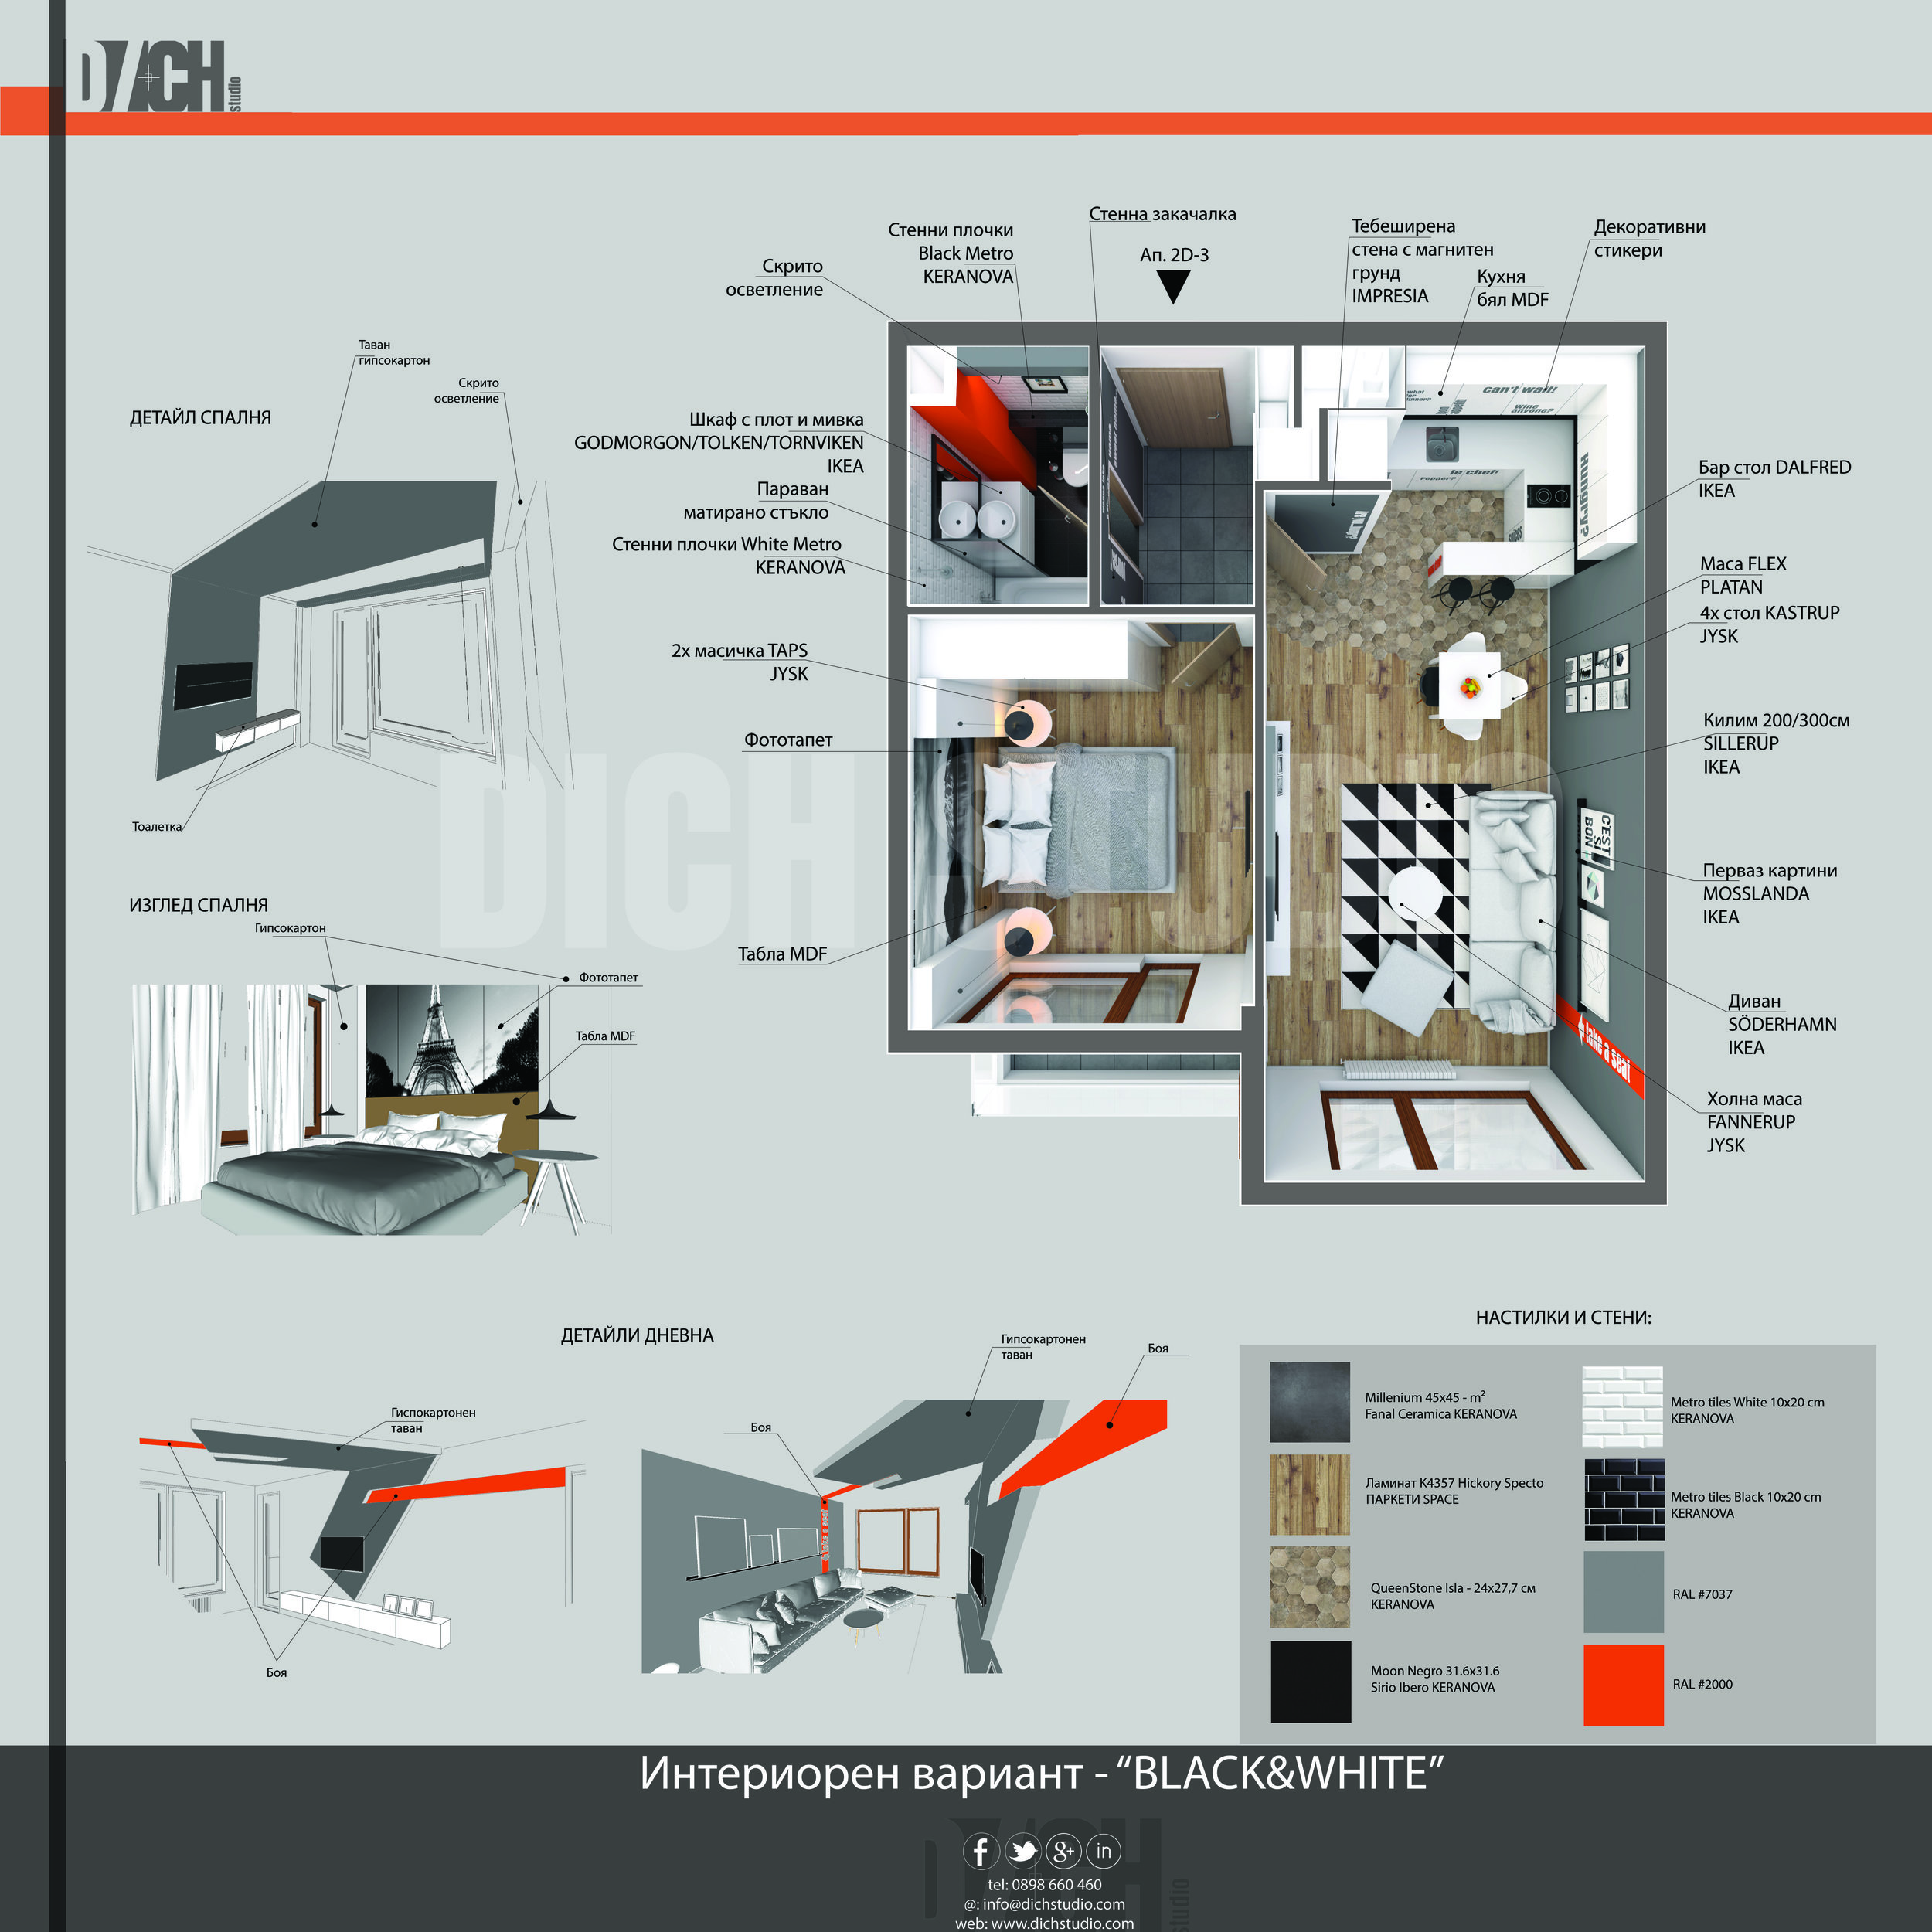 концепция интериорен дизайн